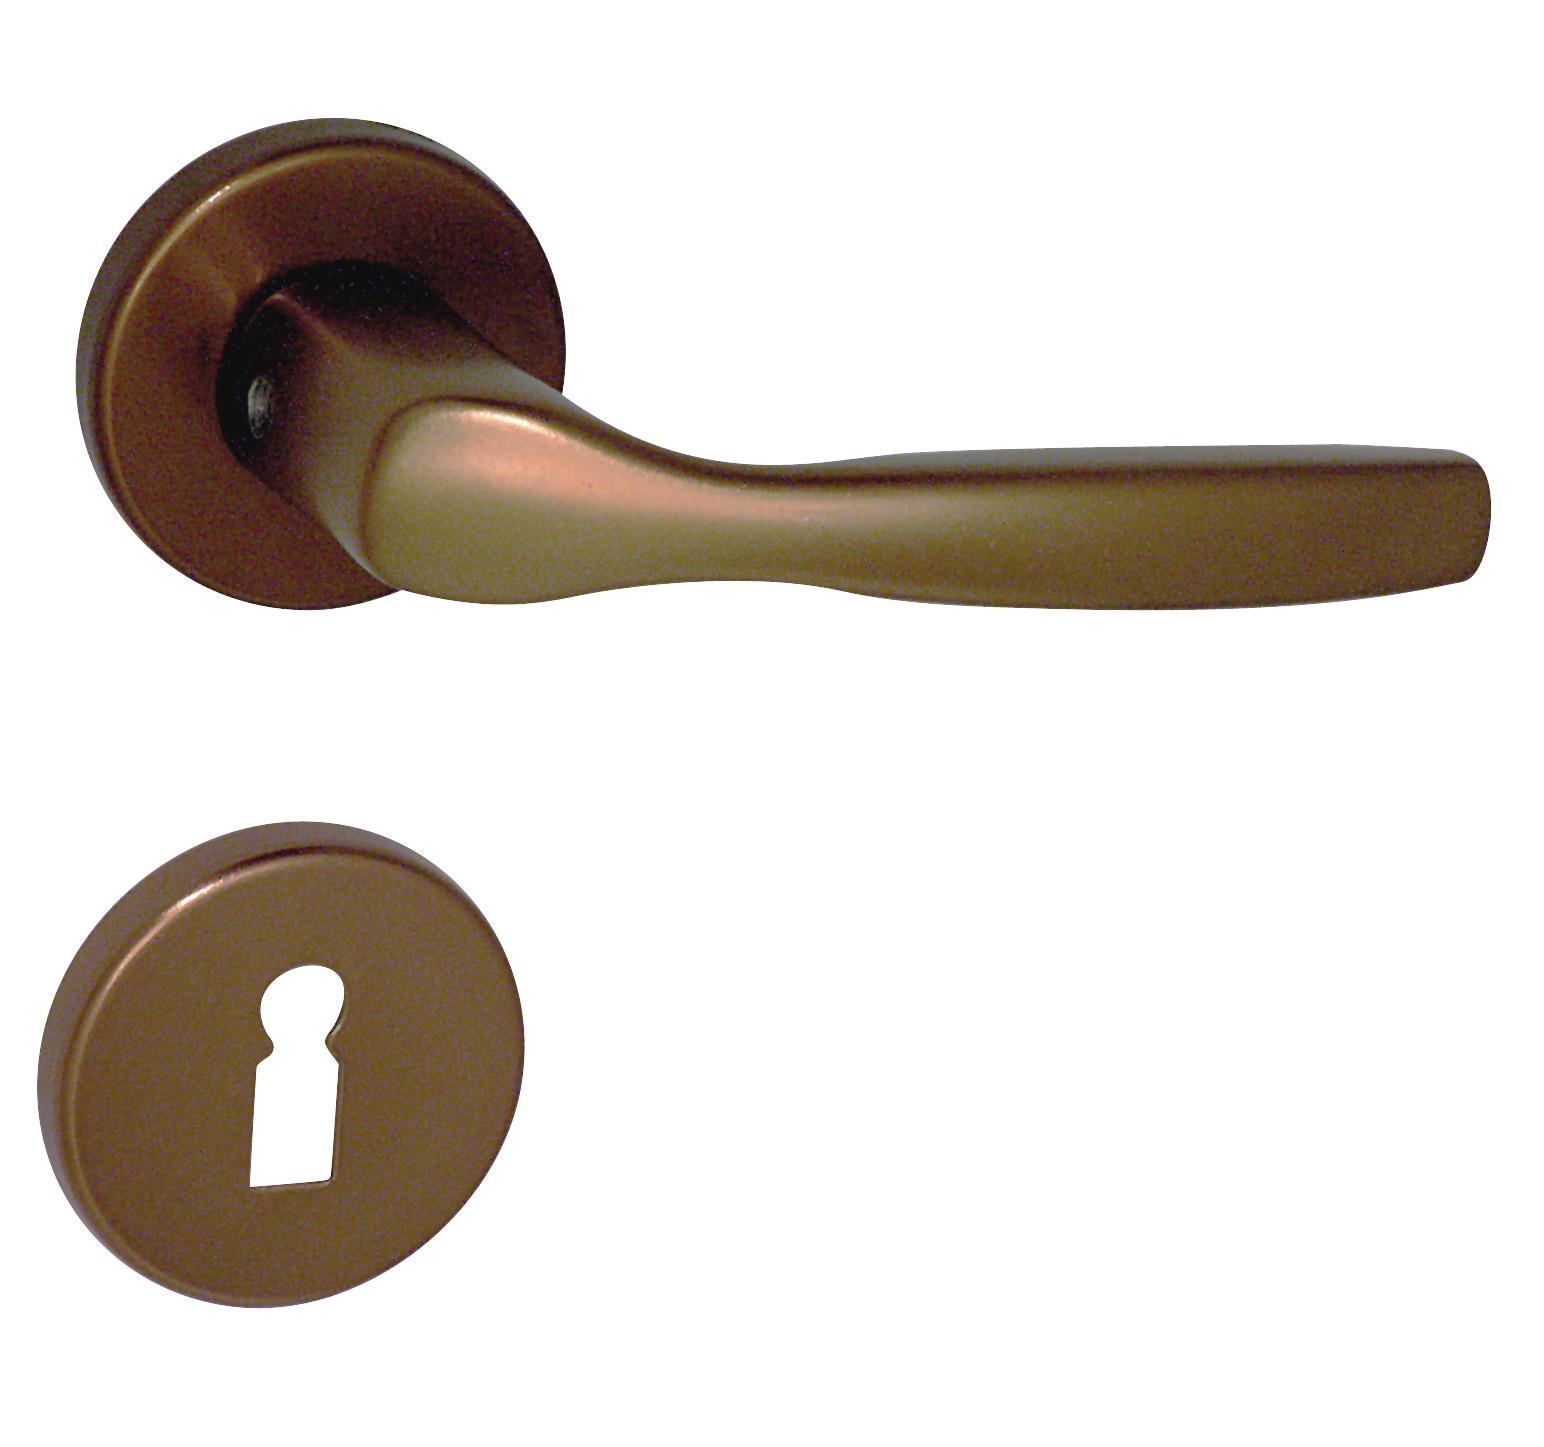 Beltéri ajtó Kilincs, Christie Alu F4 Roz Pz BAUplaza Kft.